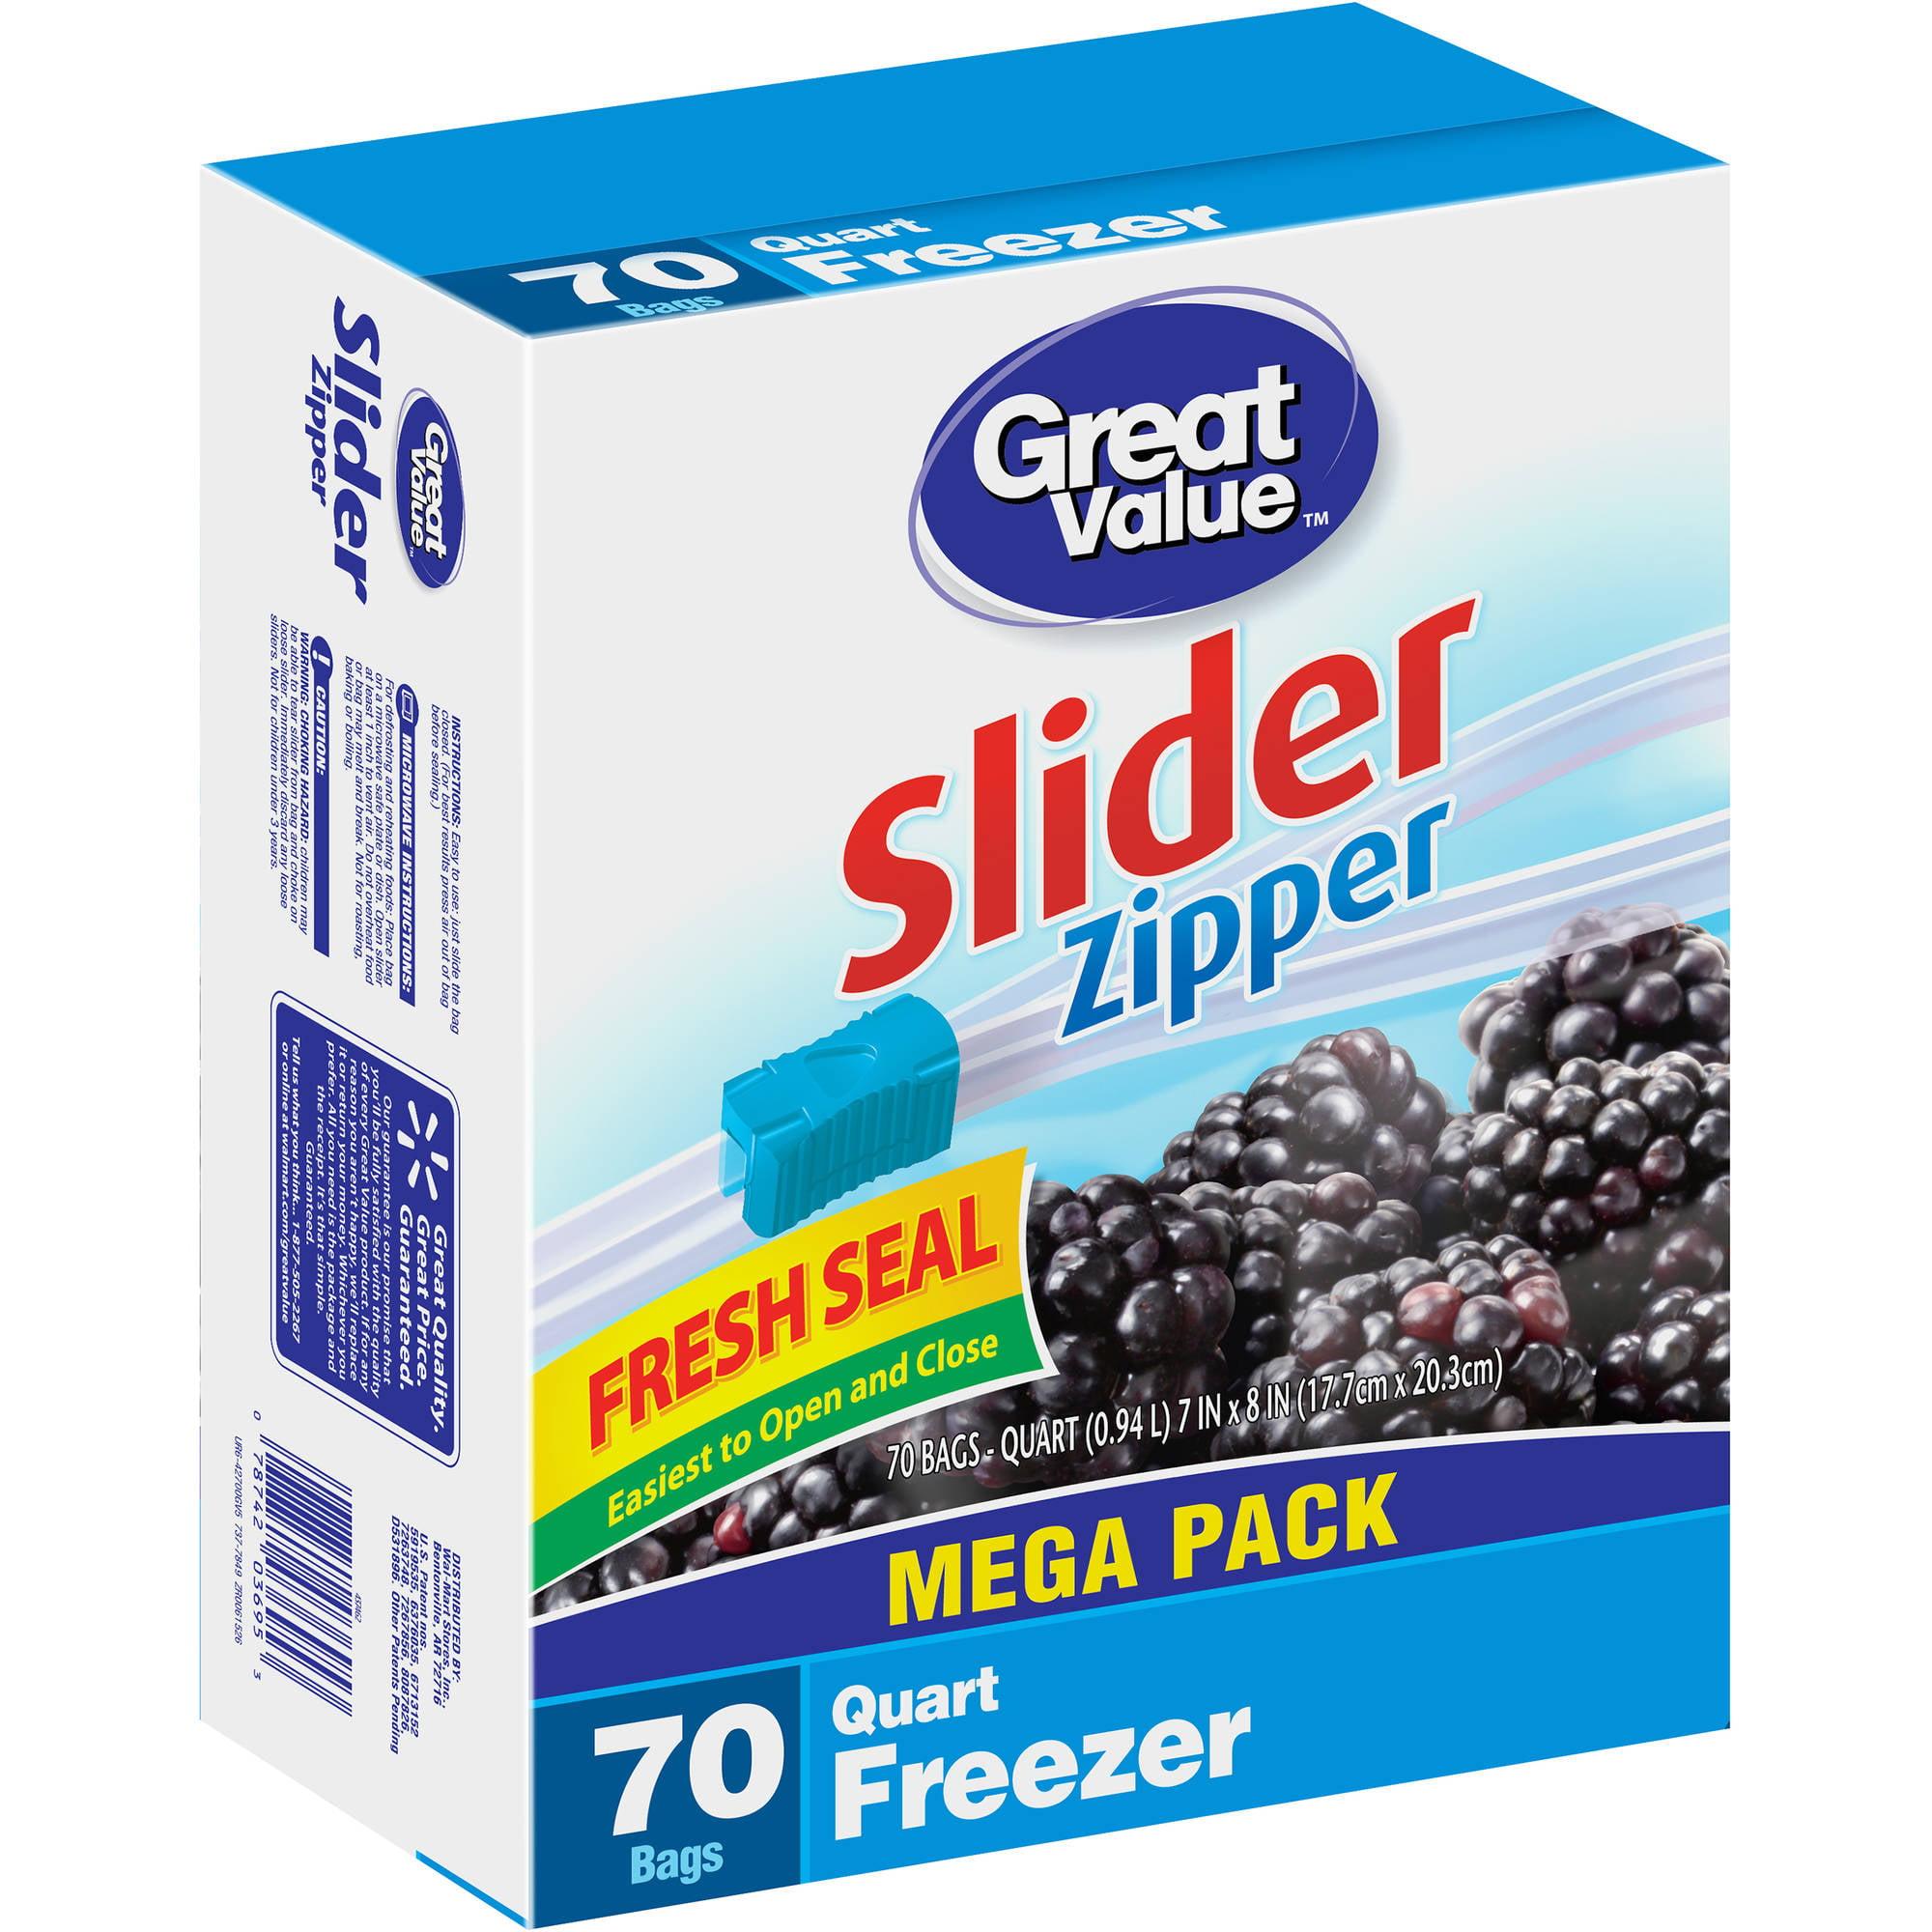 Great Value Quart Freezer Bags, 70 count